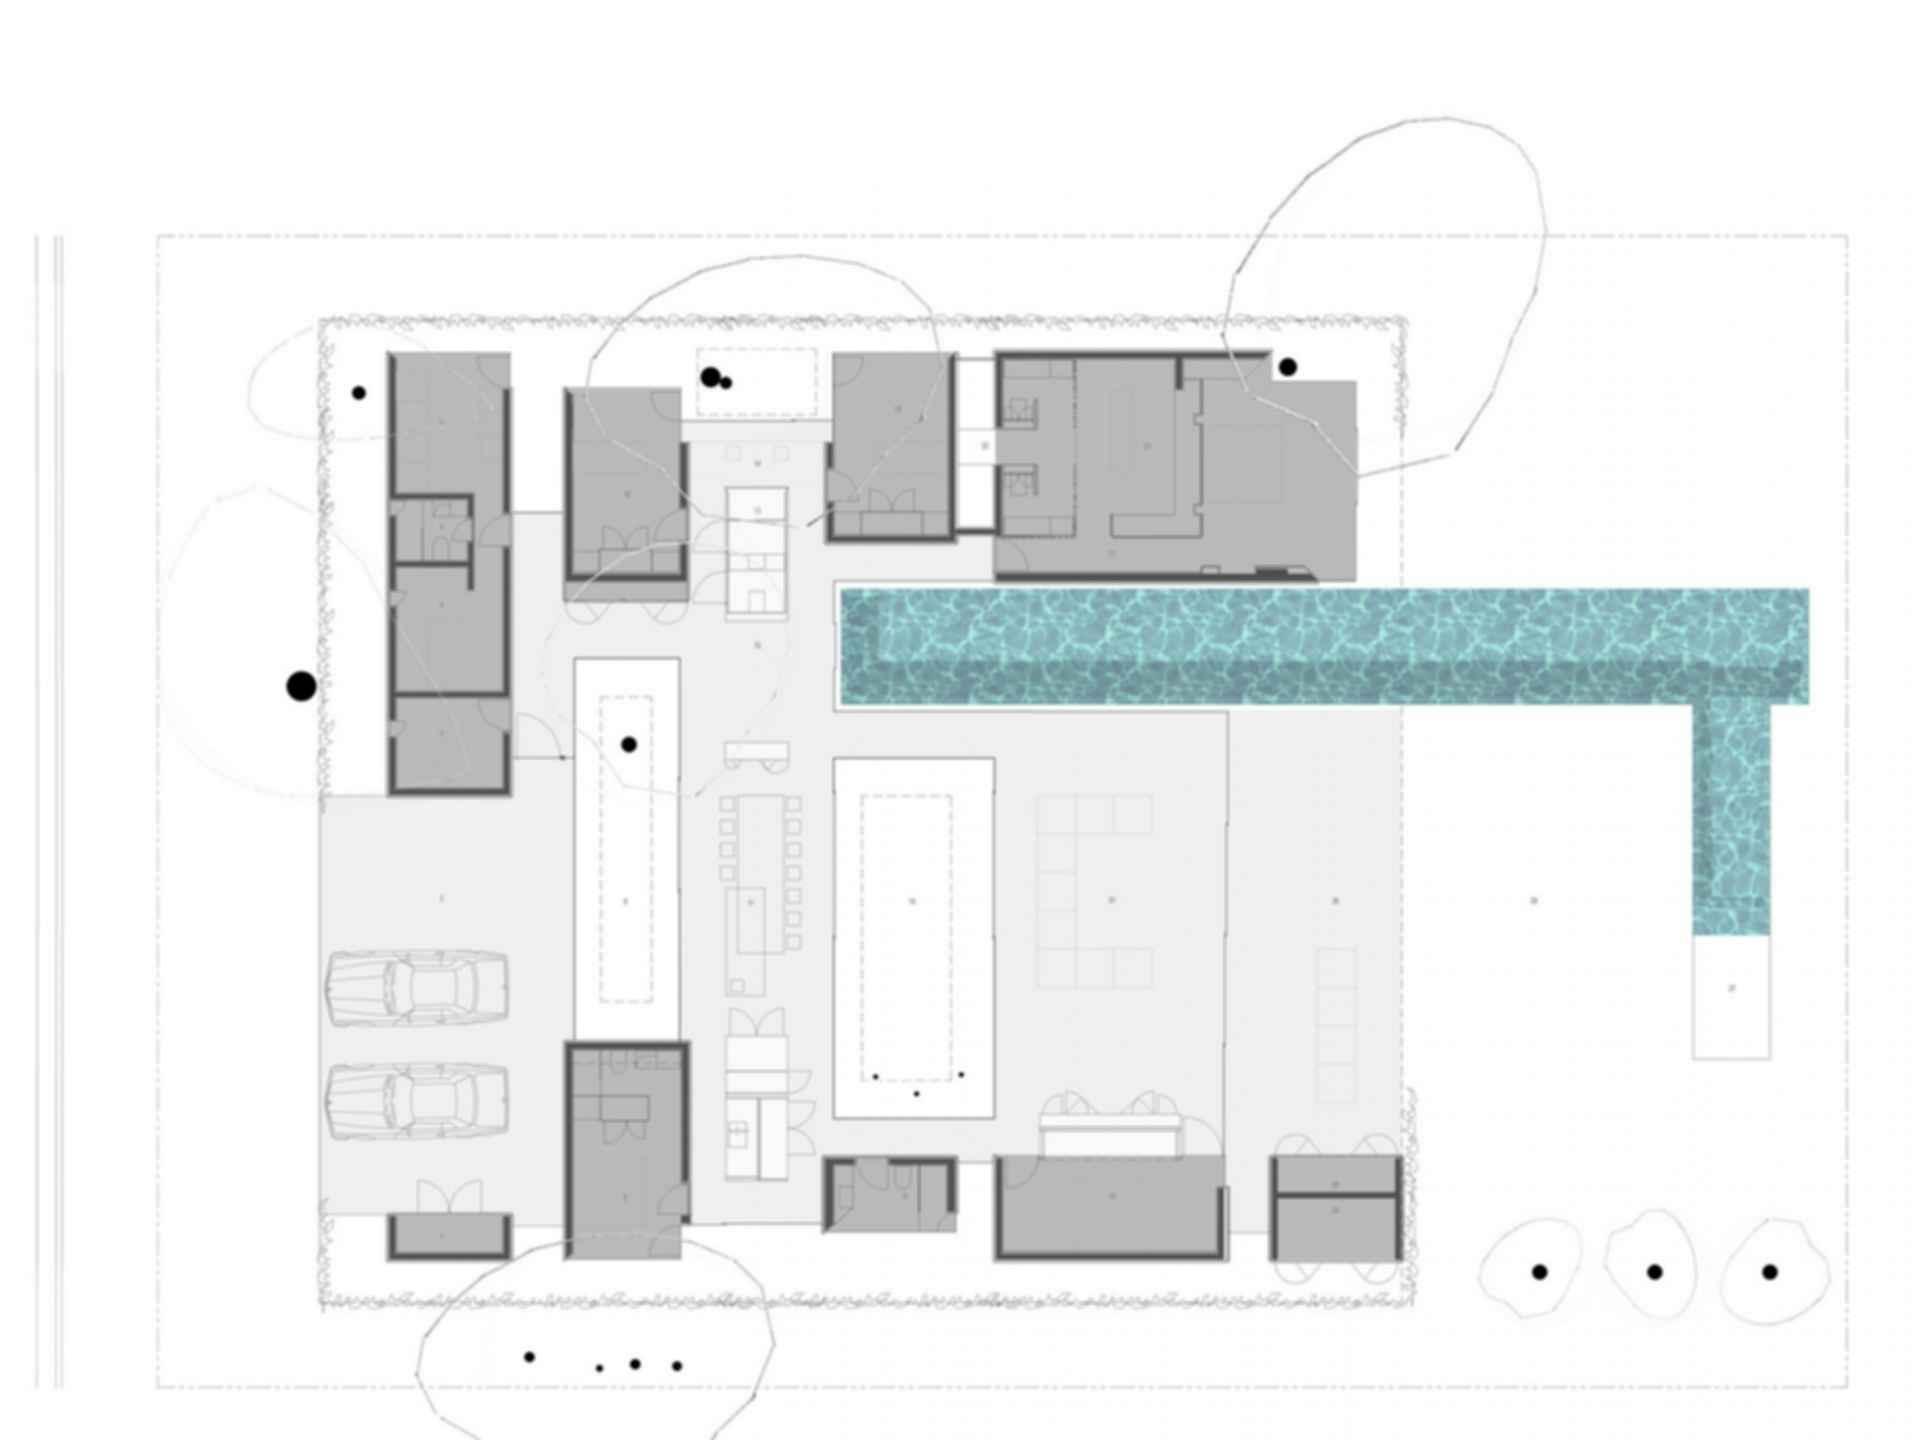 INOUT House - floor plan